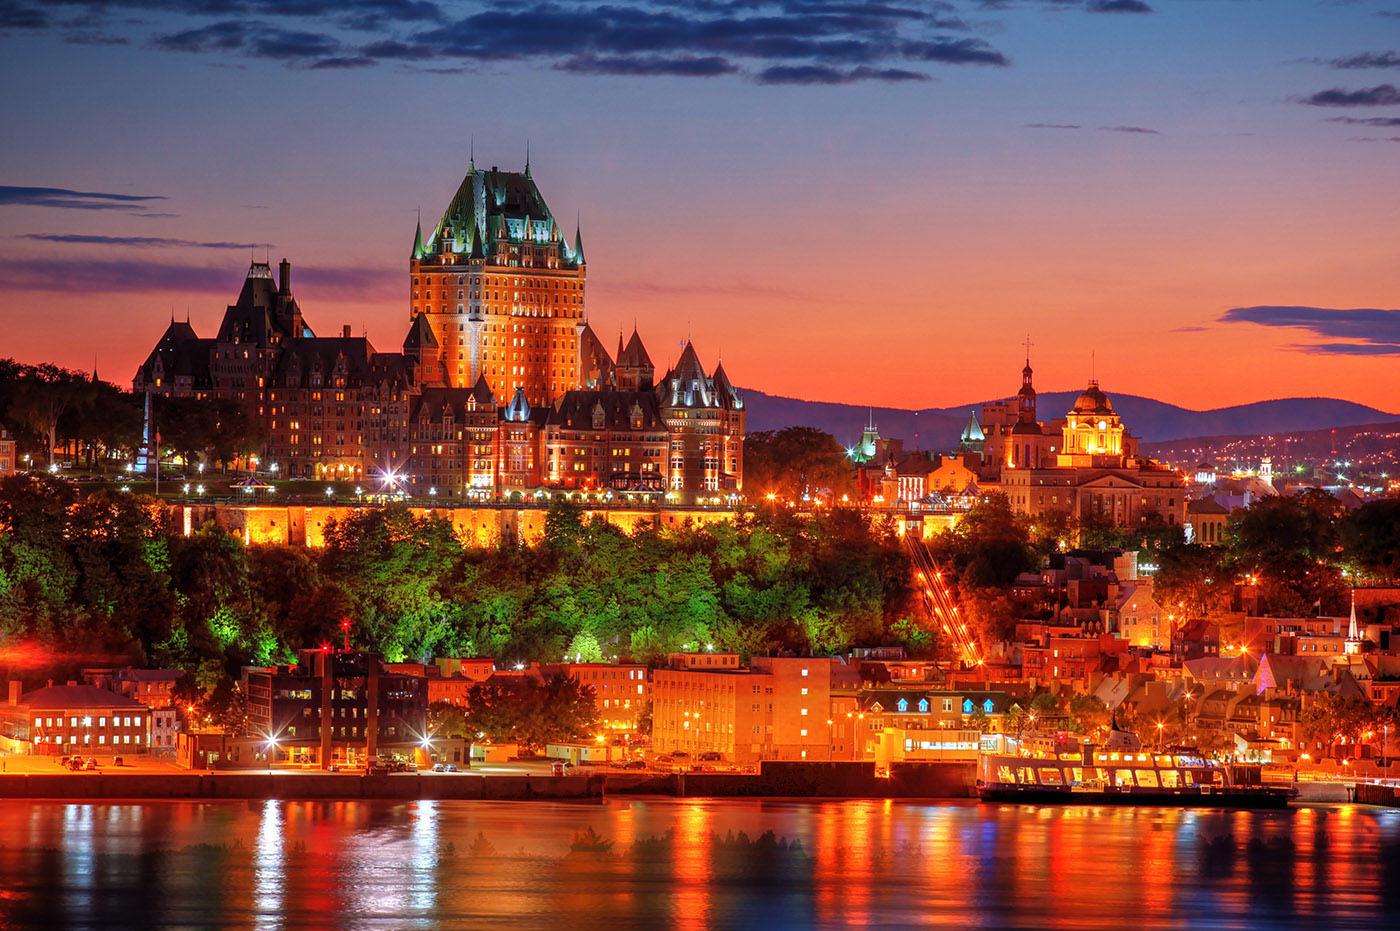 Quebec Frontenac Castle Montage 02 - Stock Photo